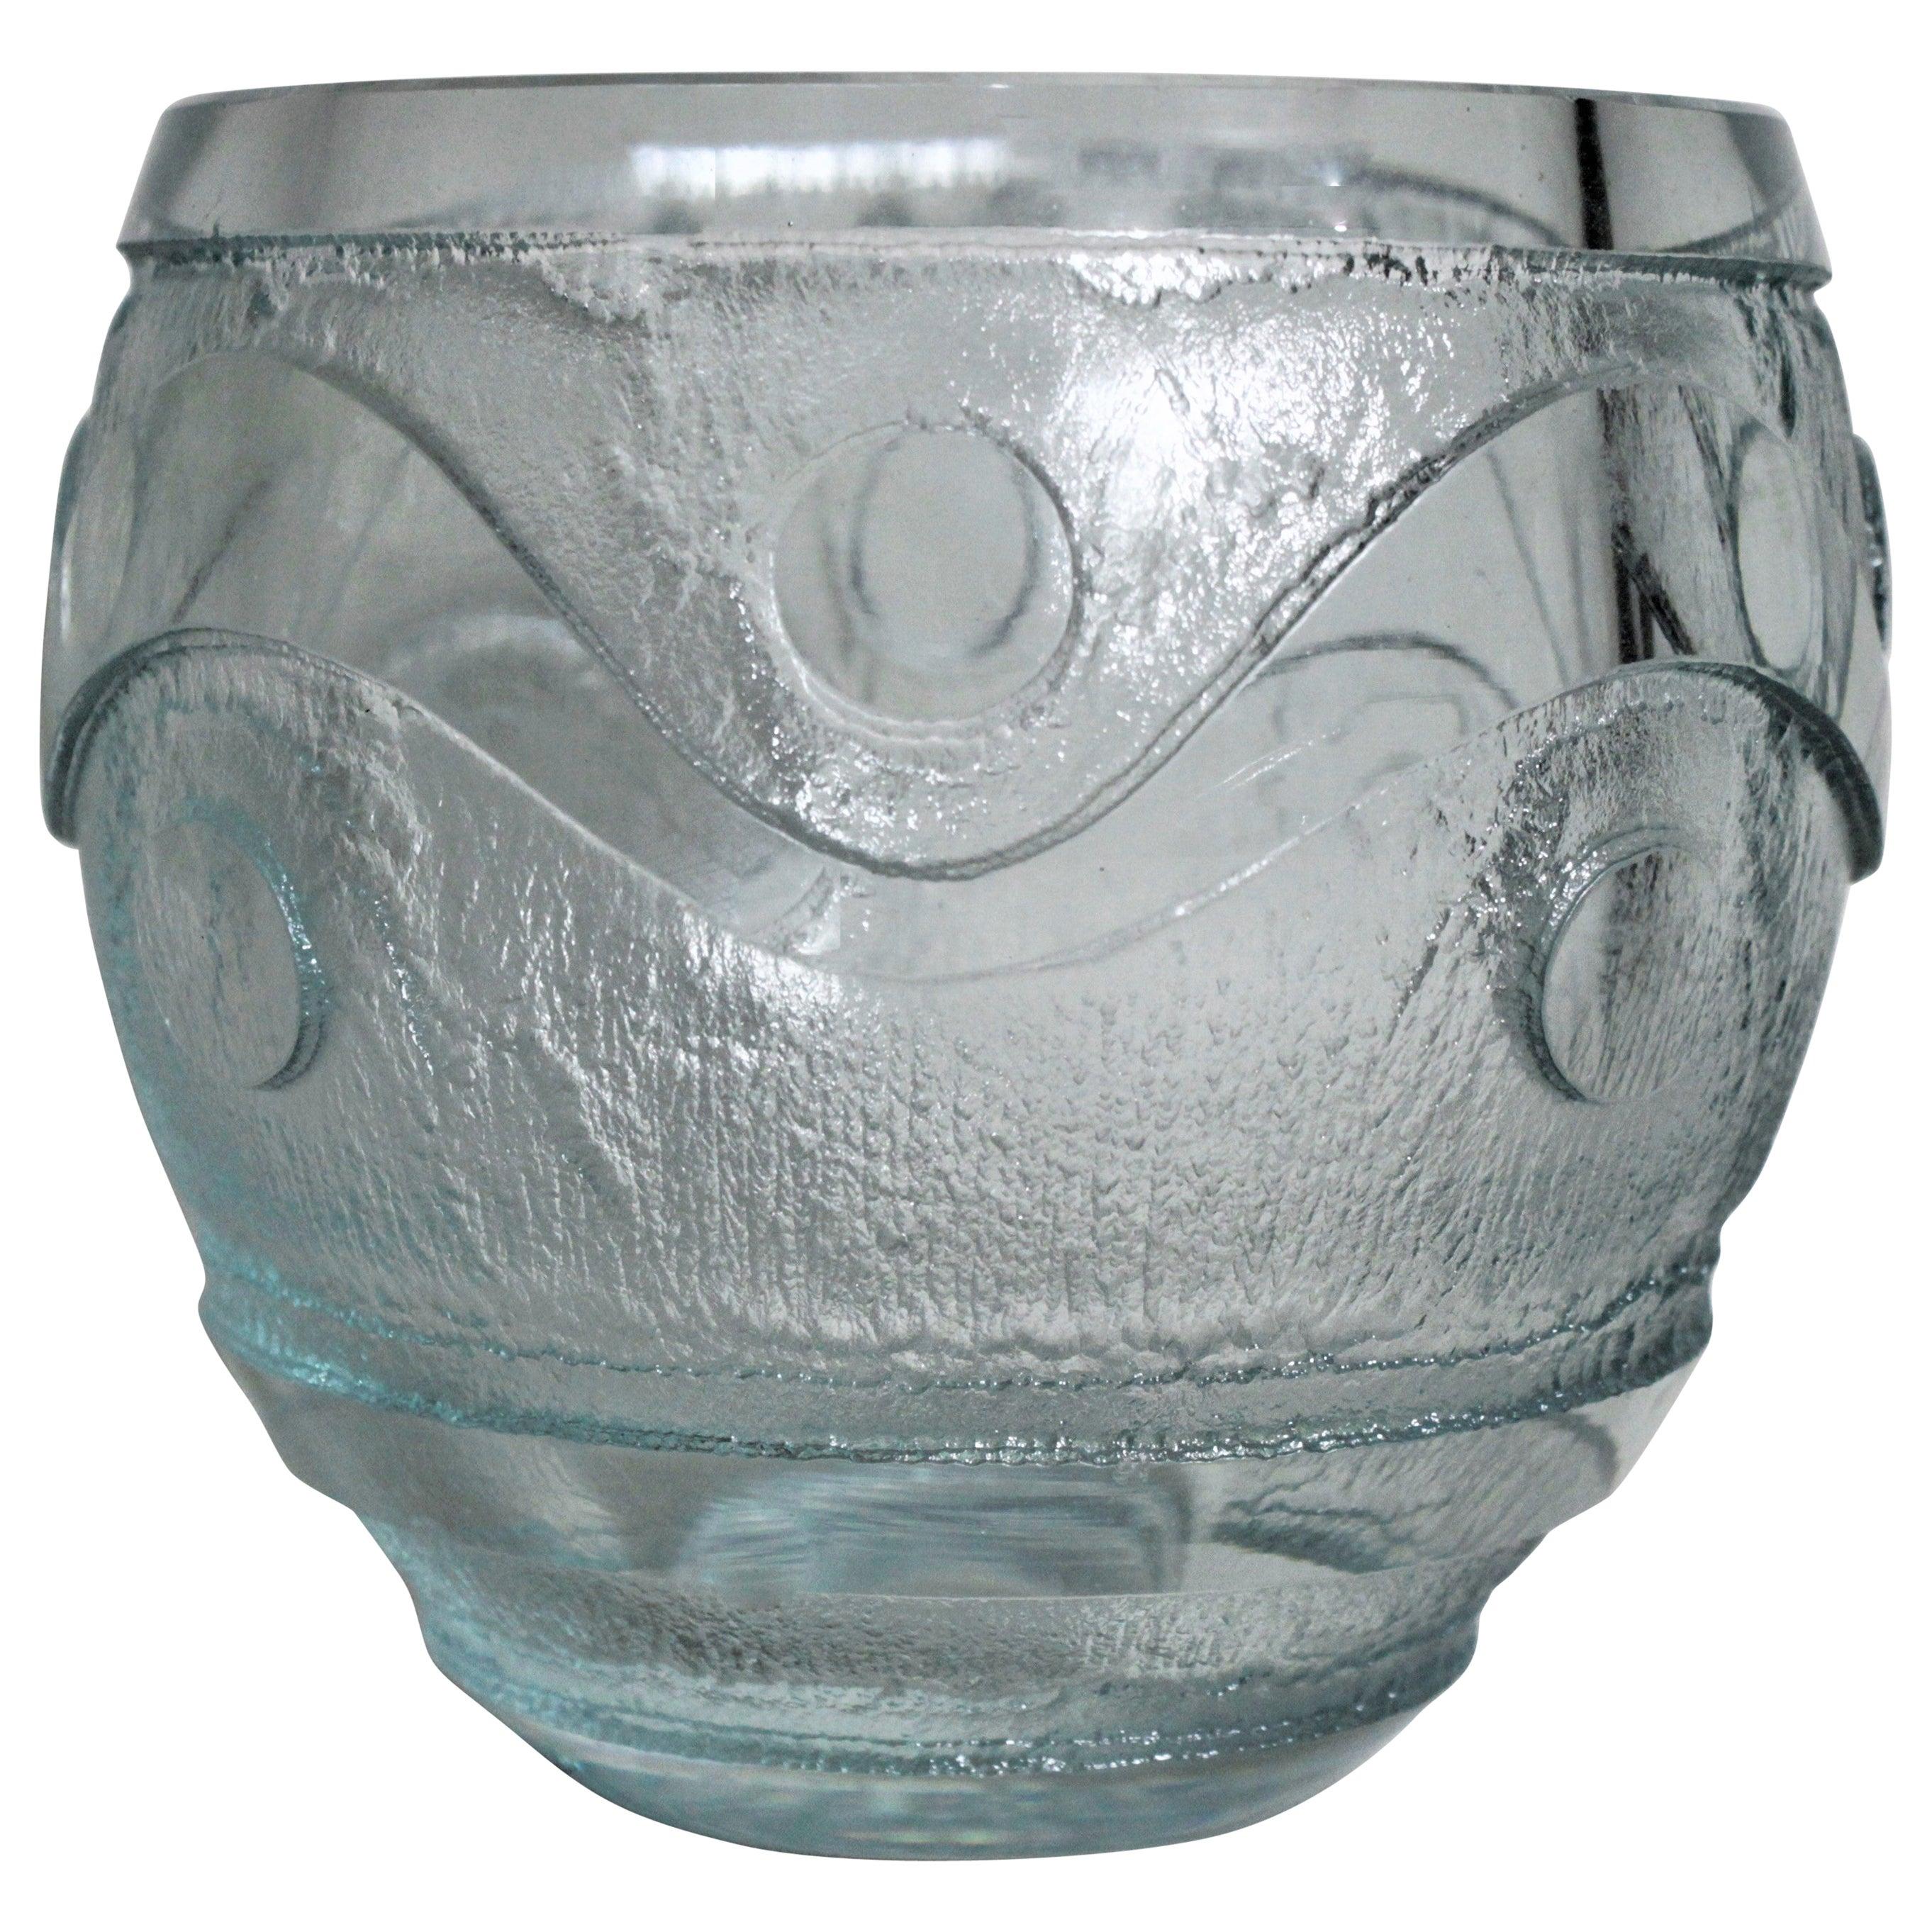 Daum Nancy French Art Deco Acid Etched Green Art Glass Vase